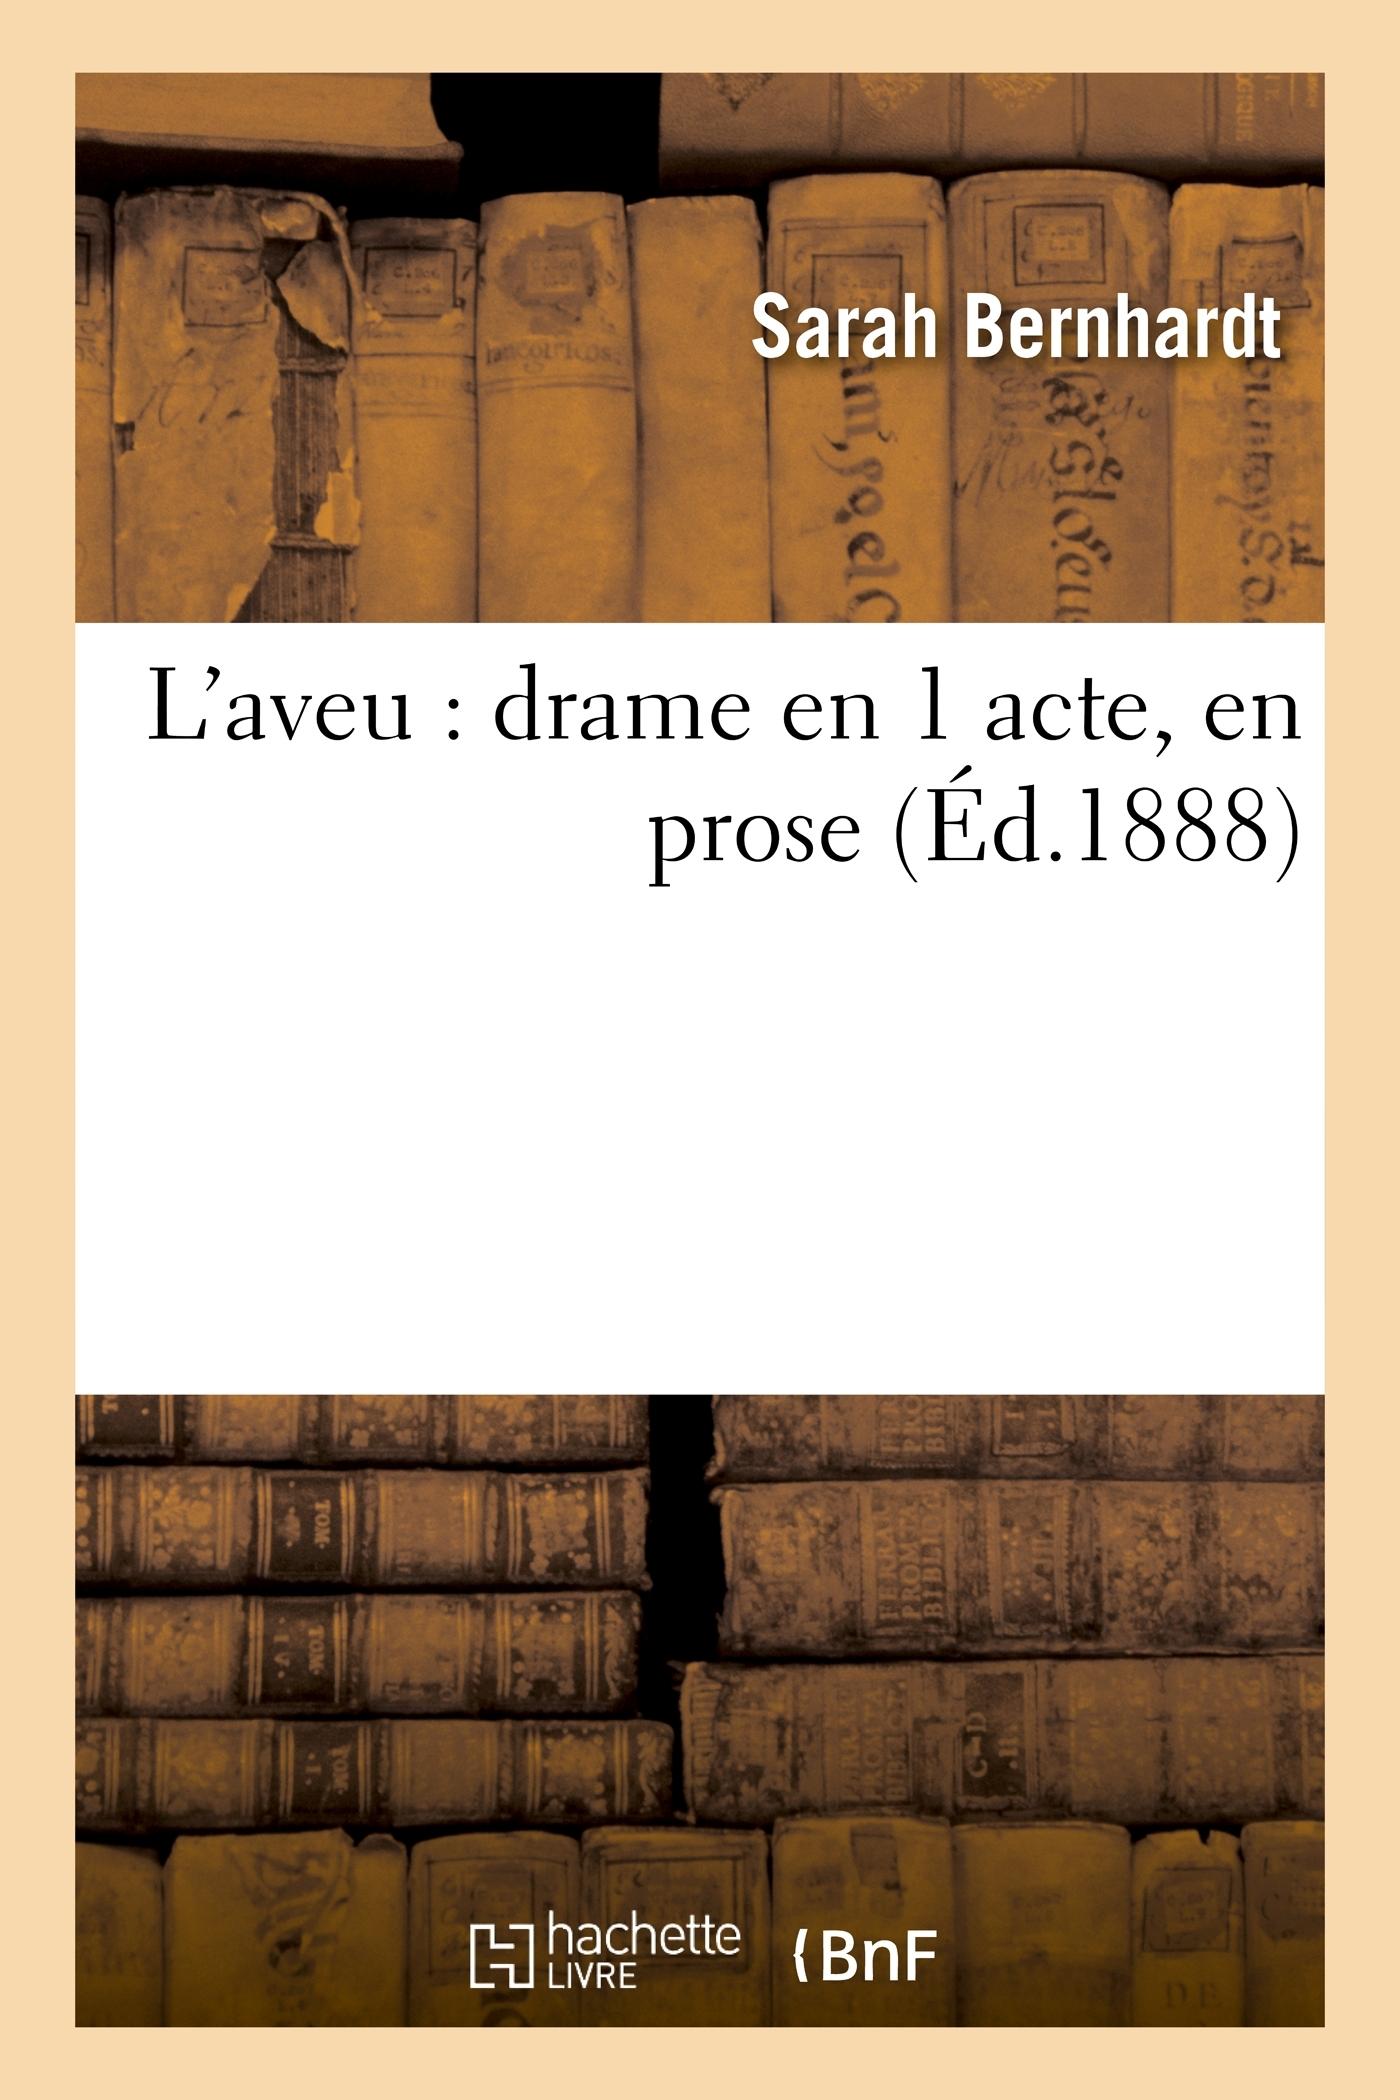 L'AVEU : DRAME EN 1 ACTE, EN PROSE